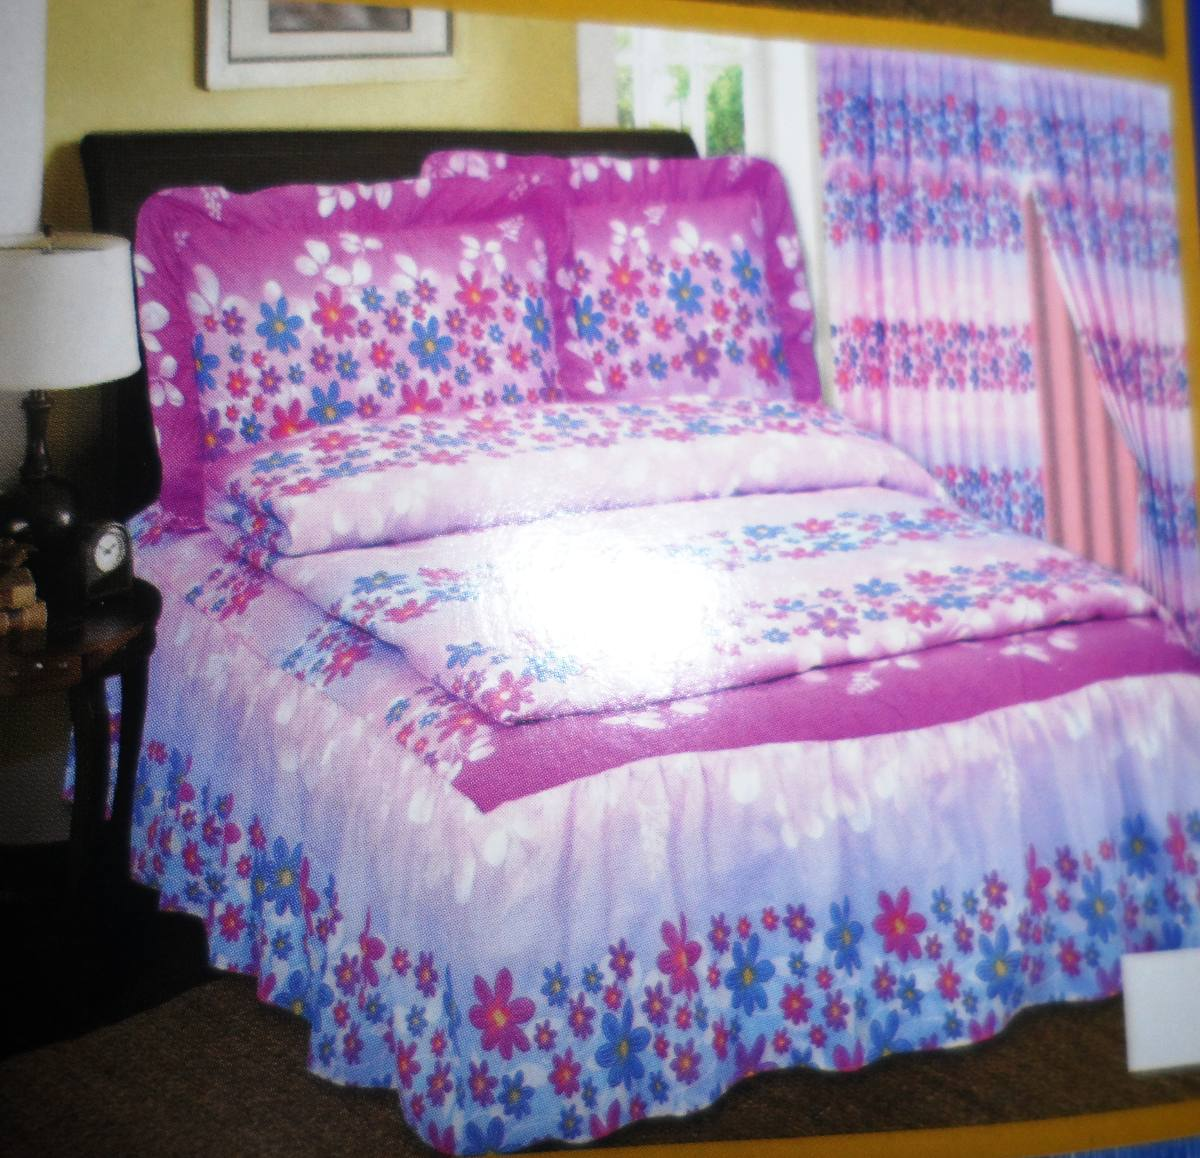 Edredon juegos de sabanas queen cortinas 9 piezas bs for Juego de dormitorio queen